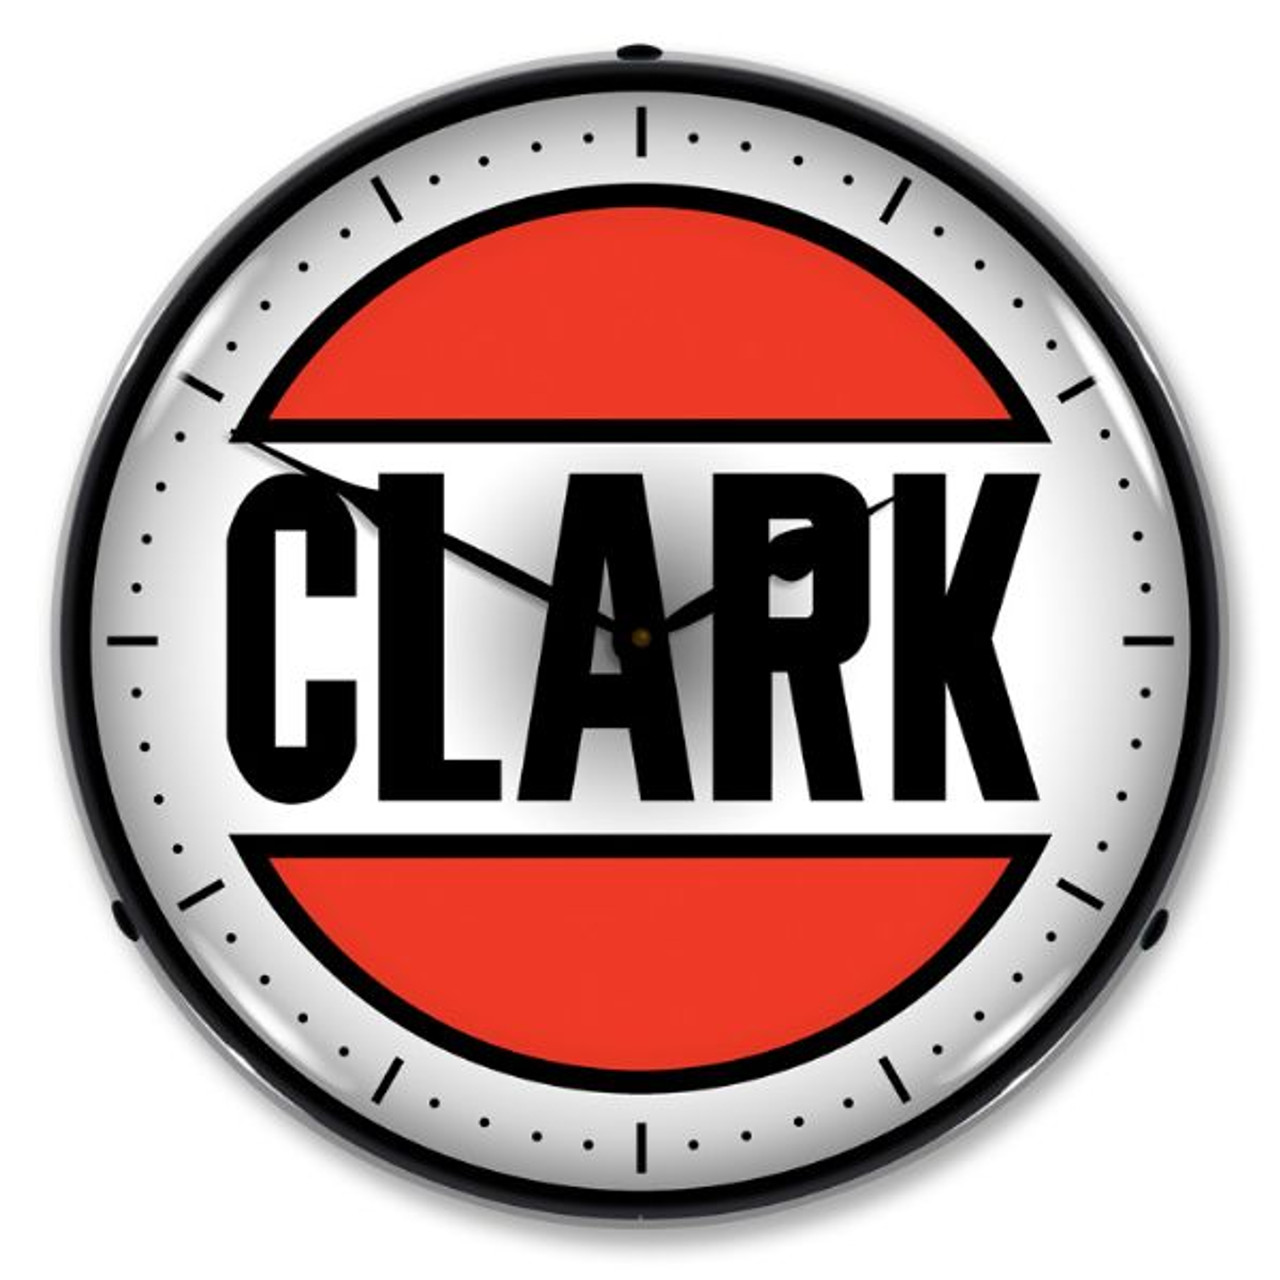 Clark Gas Lighted Wall Clock